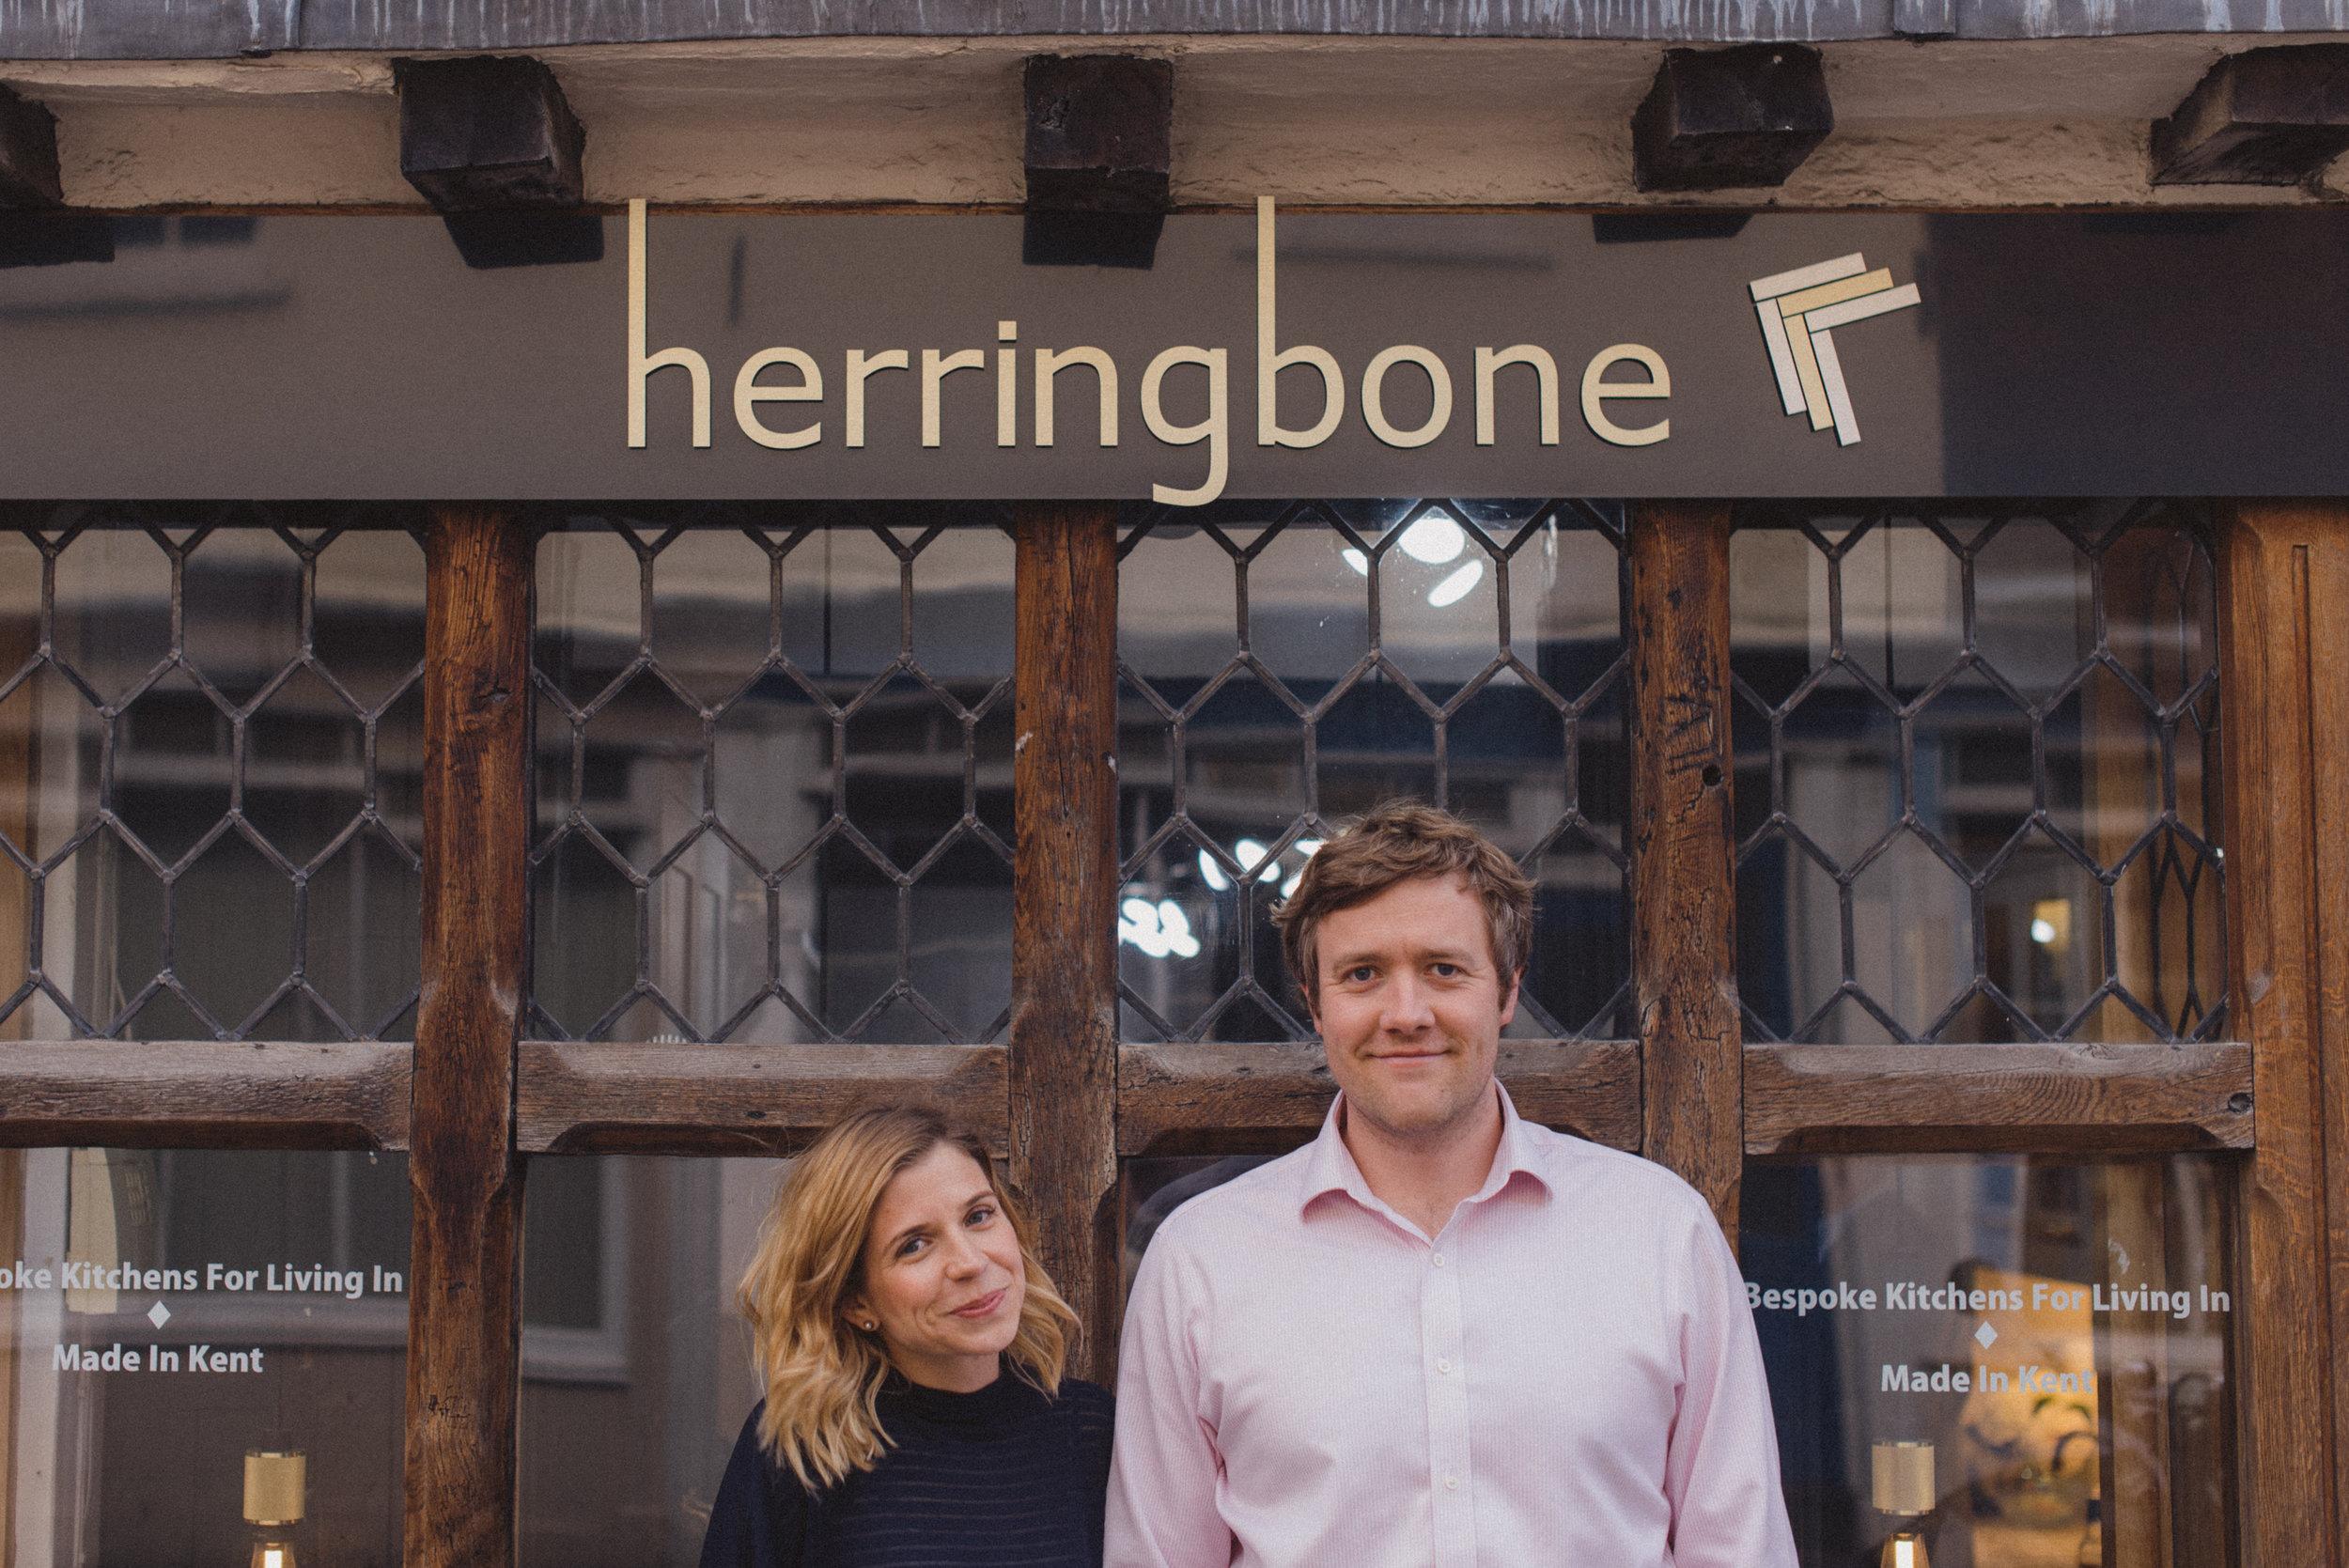 Herringbone Kitchens